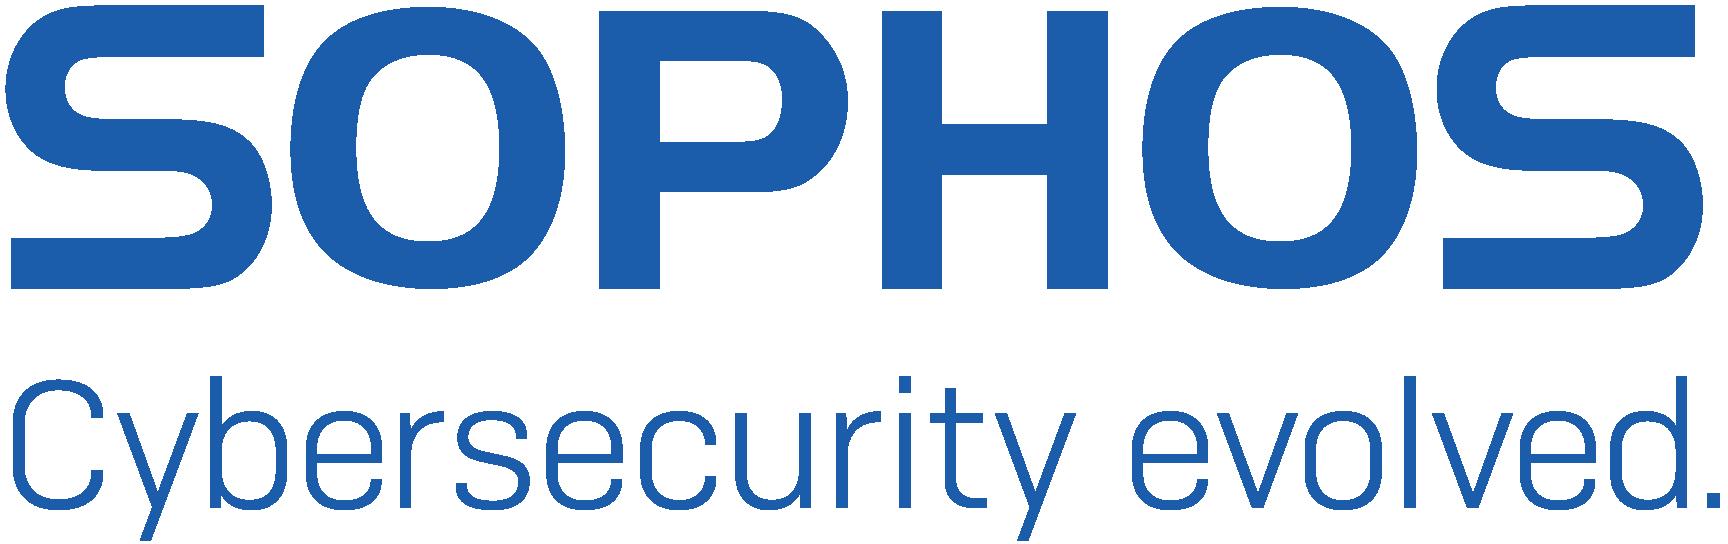 Sophos Cybersecurity Evolved logo 72dpi RGB